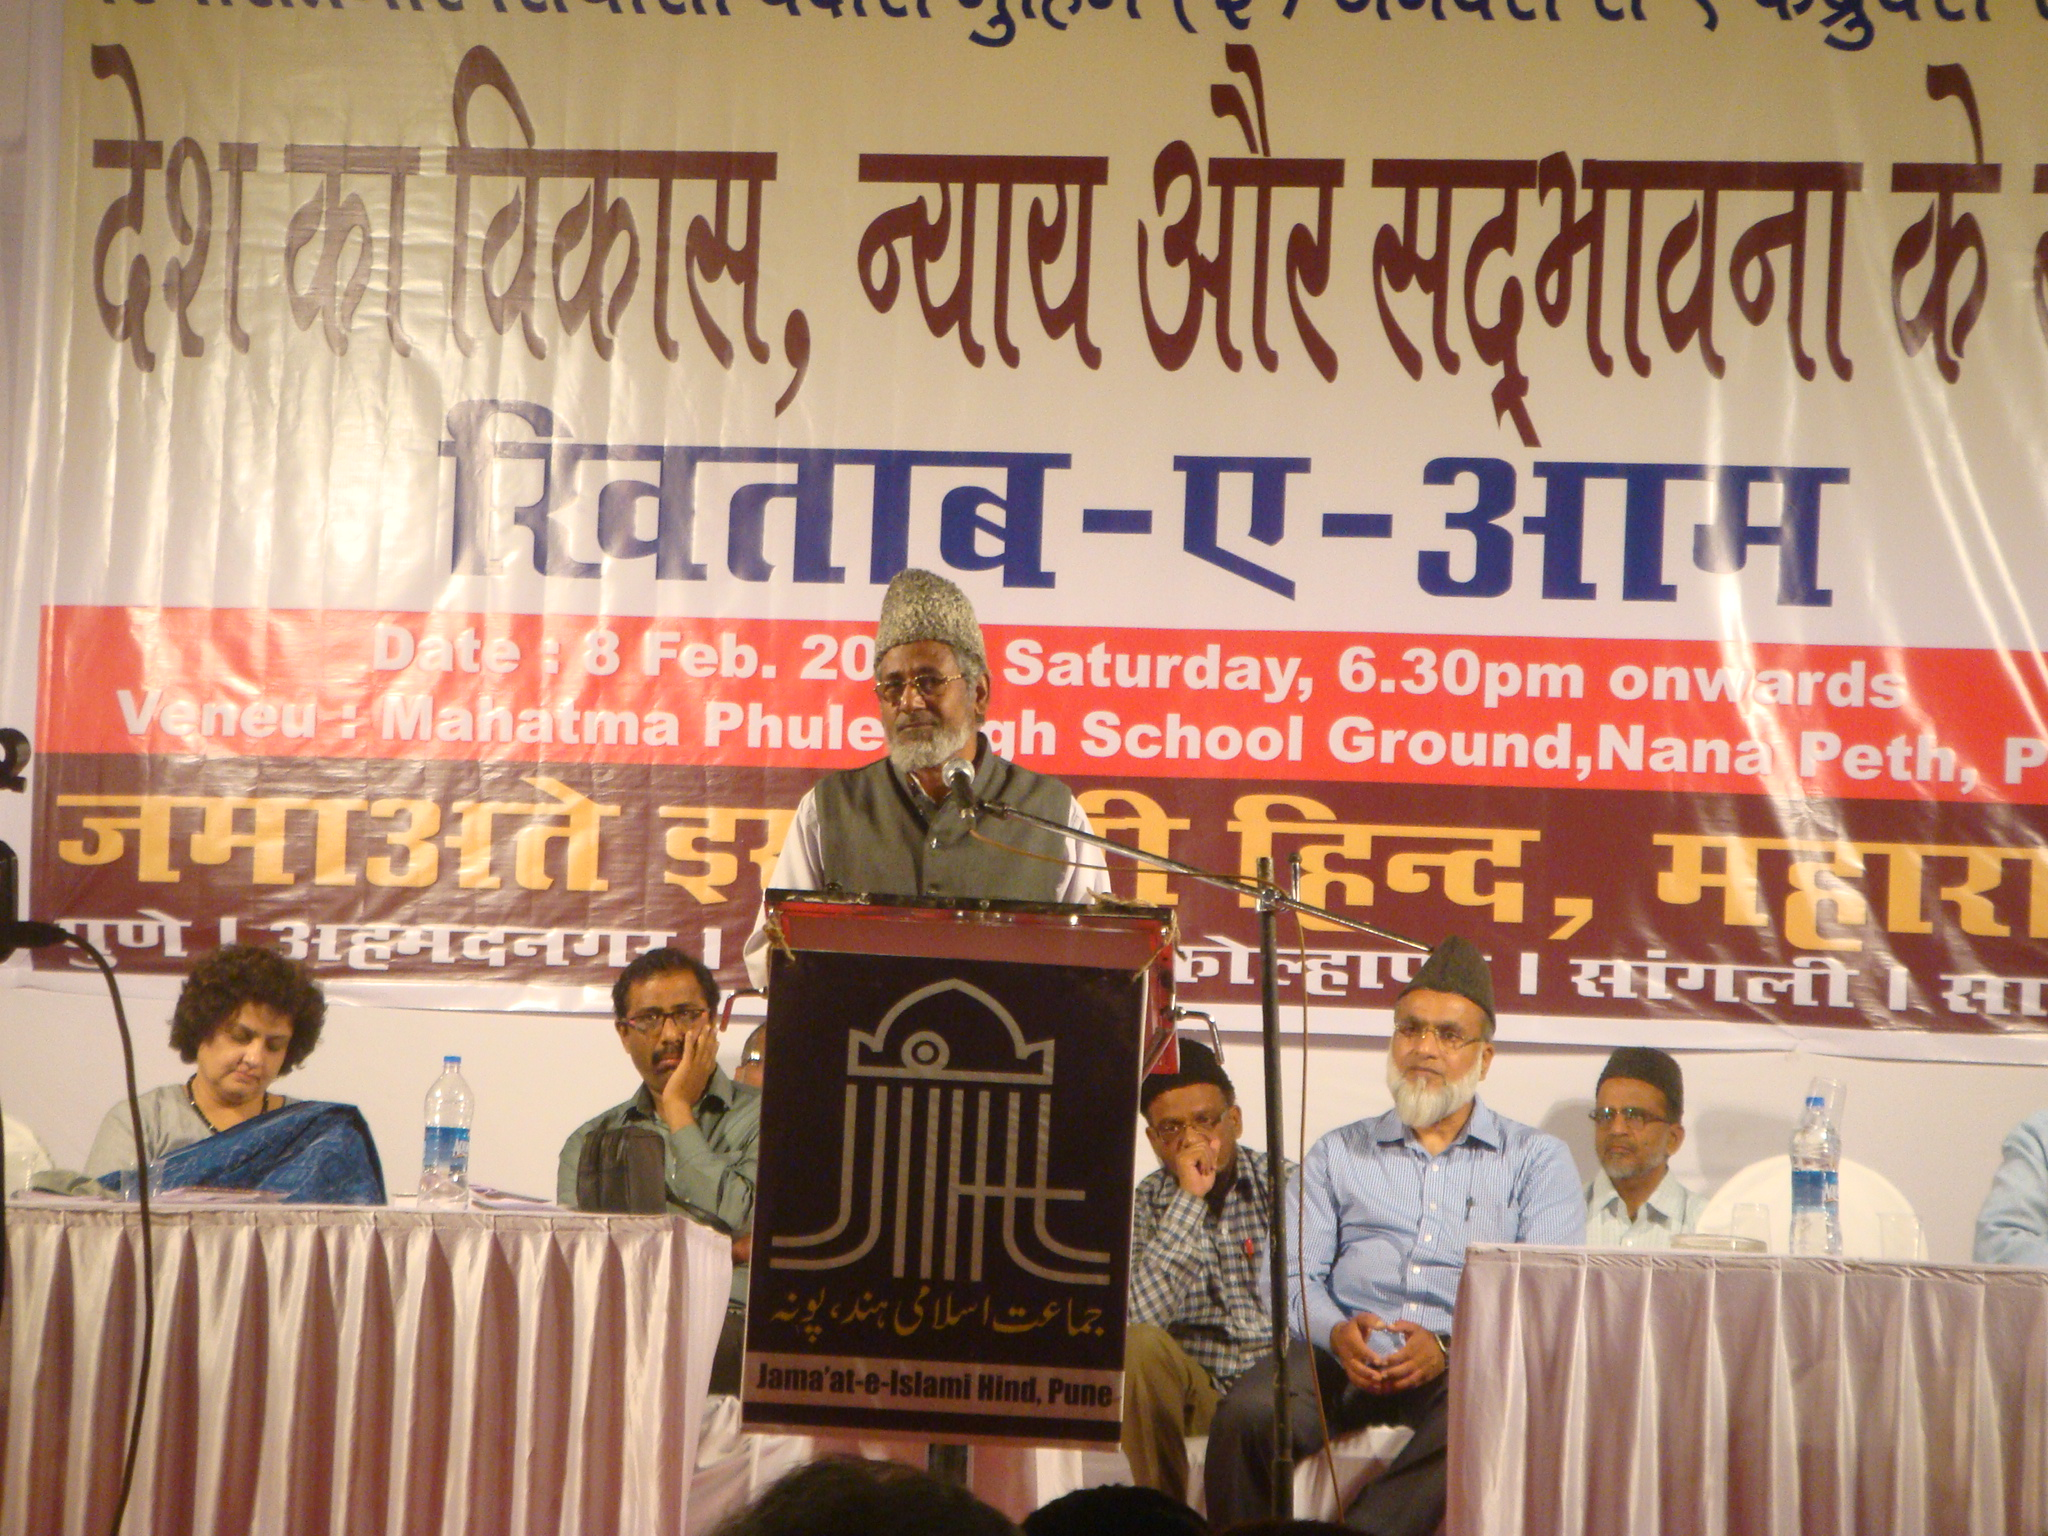 Moulana Nusrat Ali addressing the Pune Regional Conference